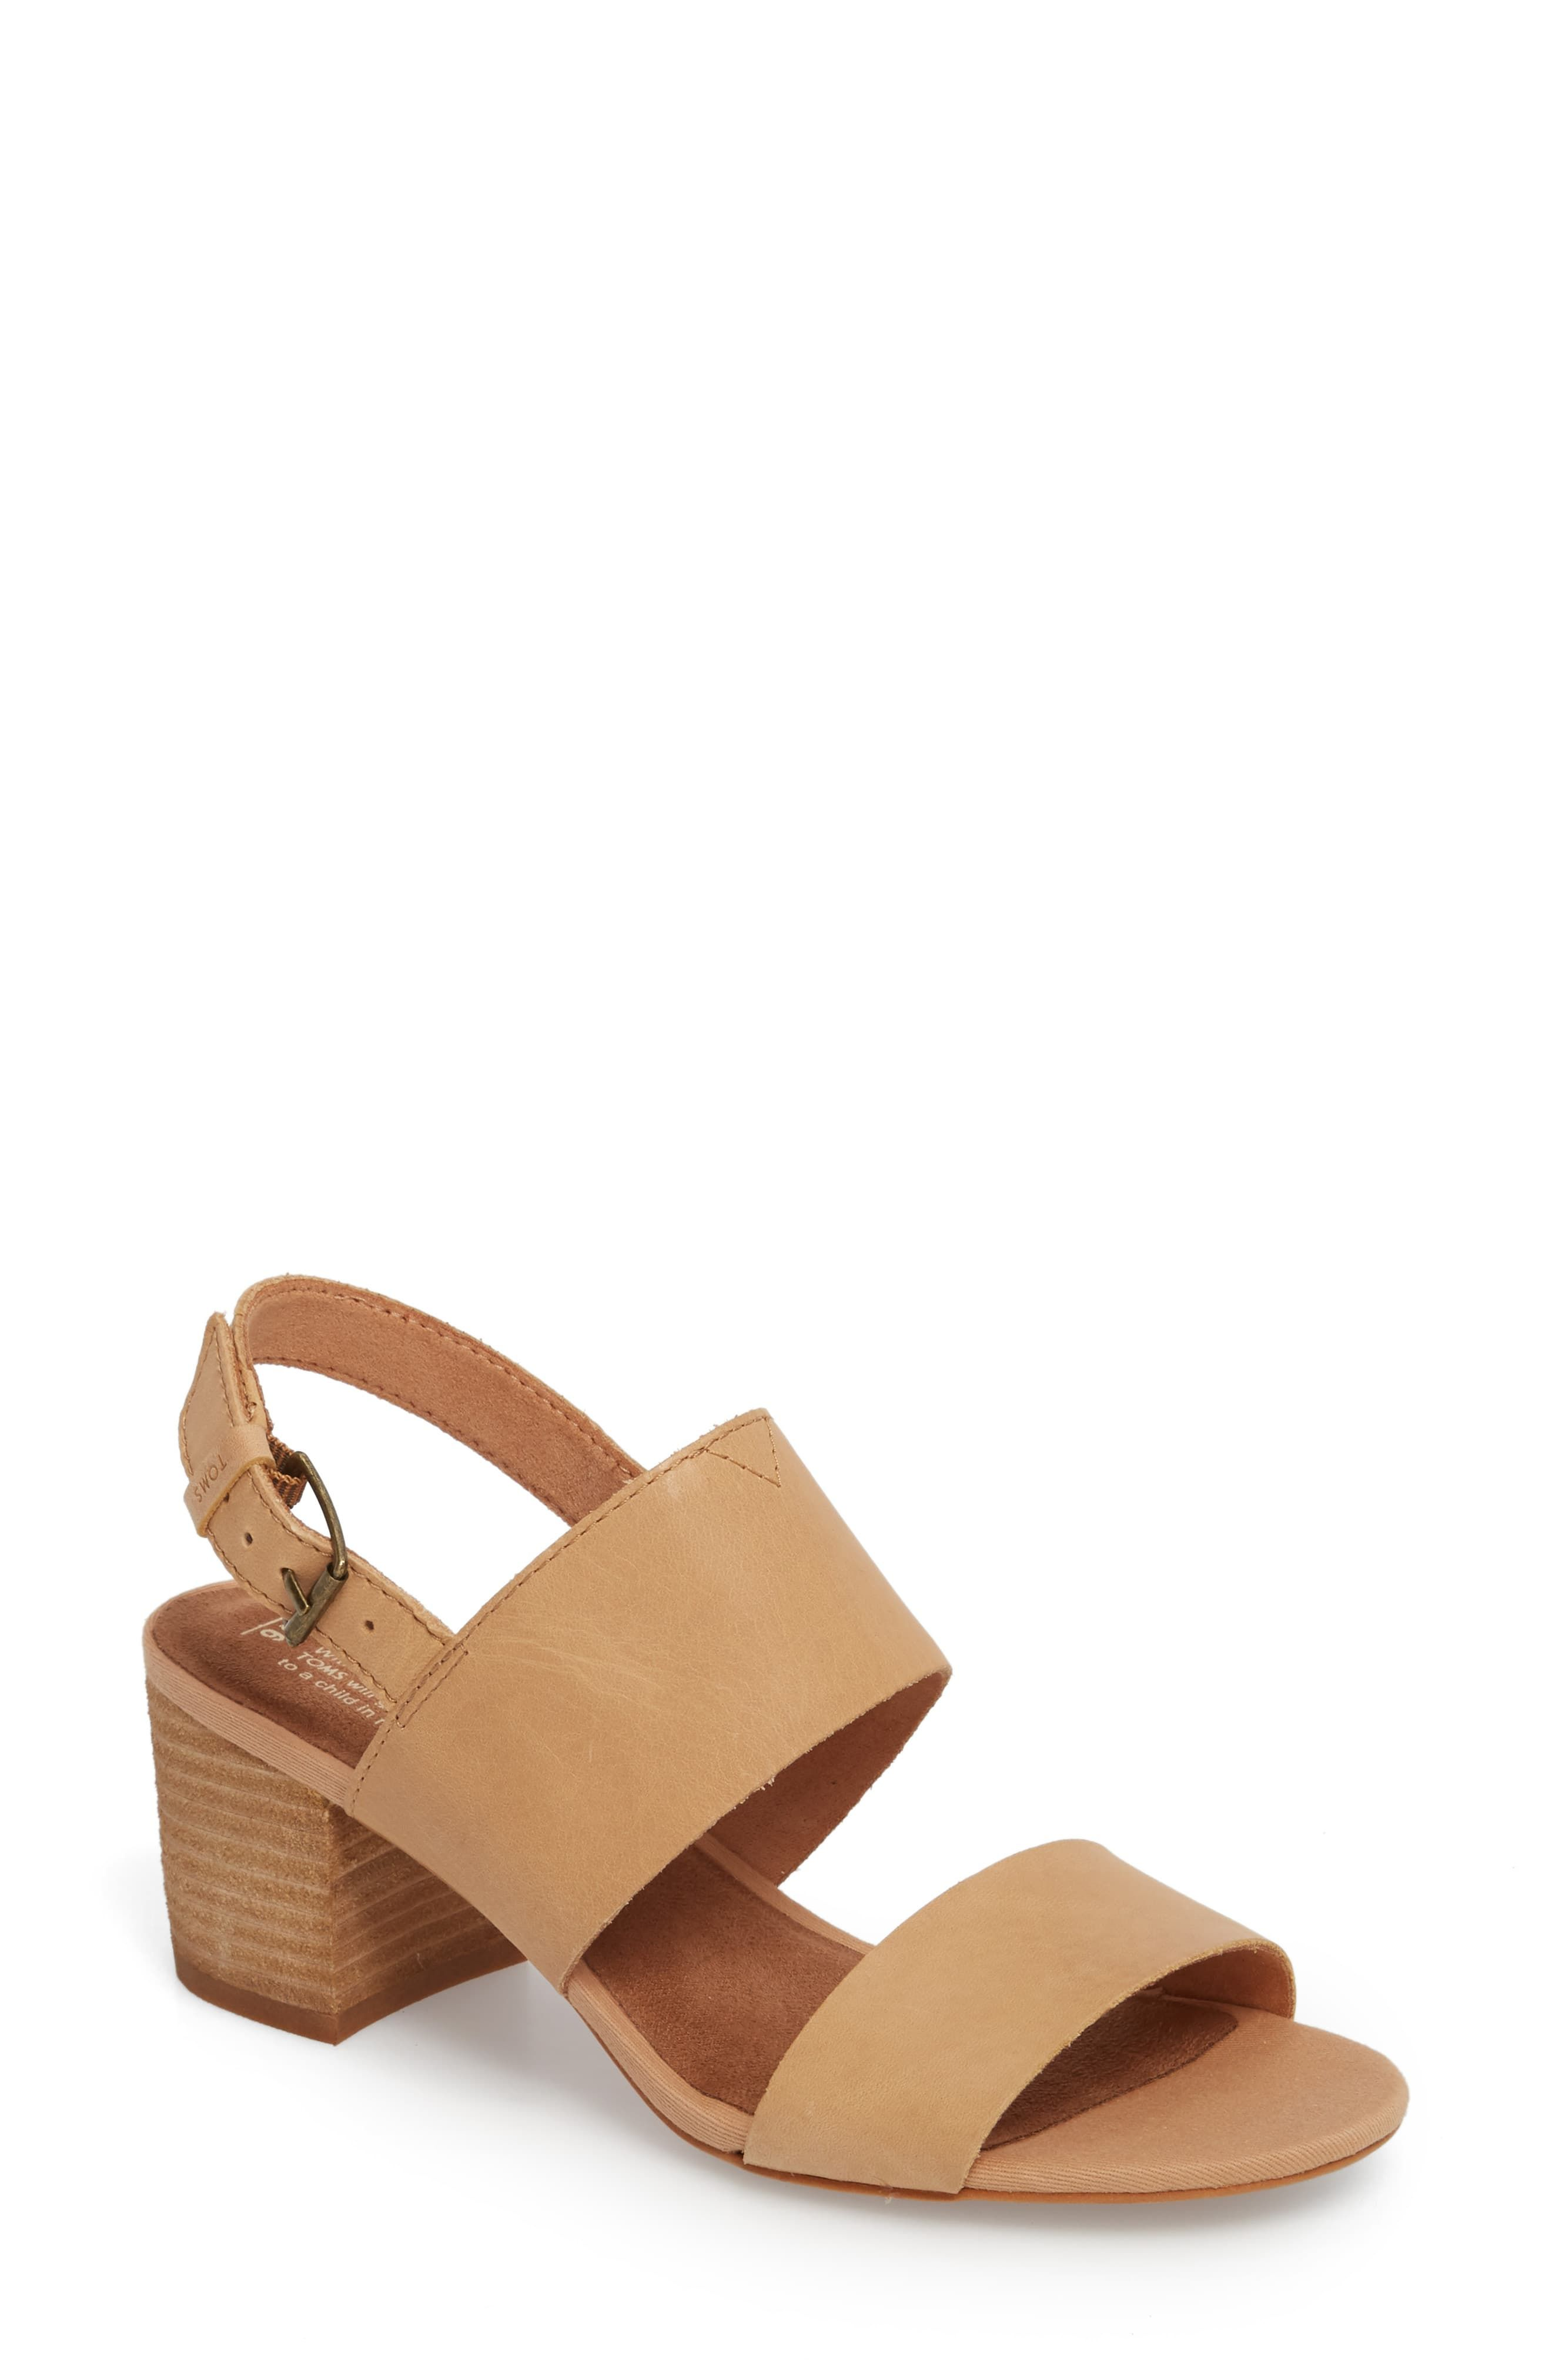 94c6d1c1863 Women's Toms Poppy Sandal, Size 5 B - Black in 2019 | Products ...